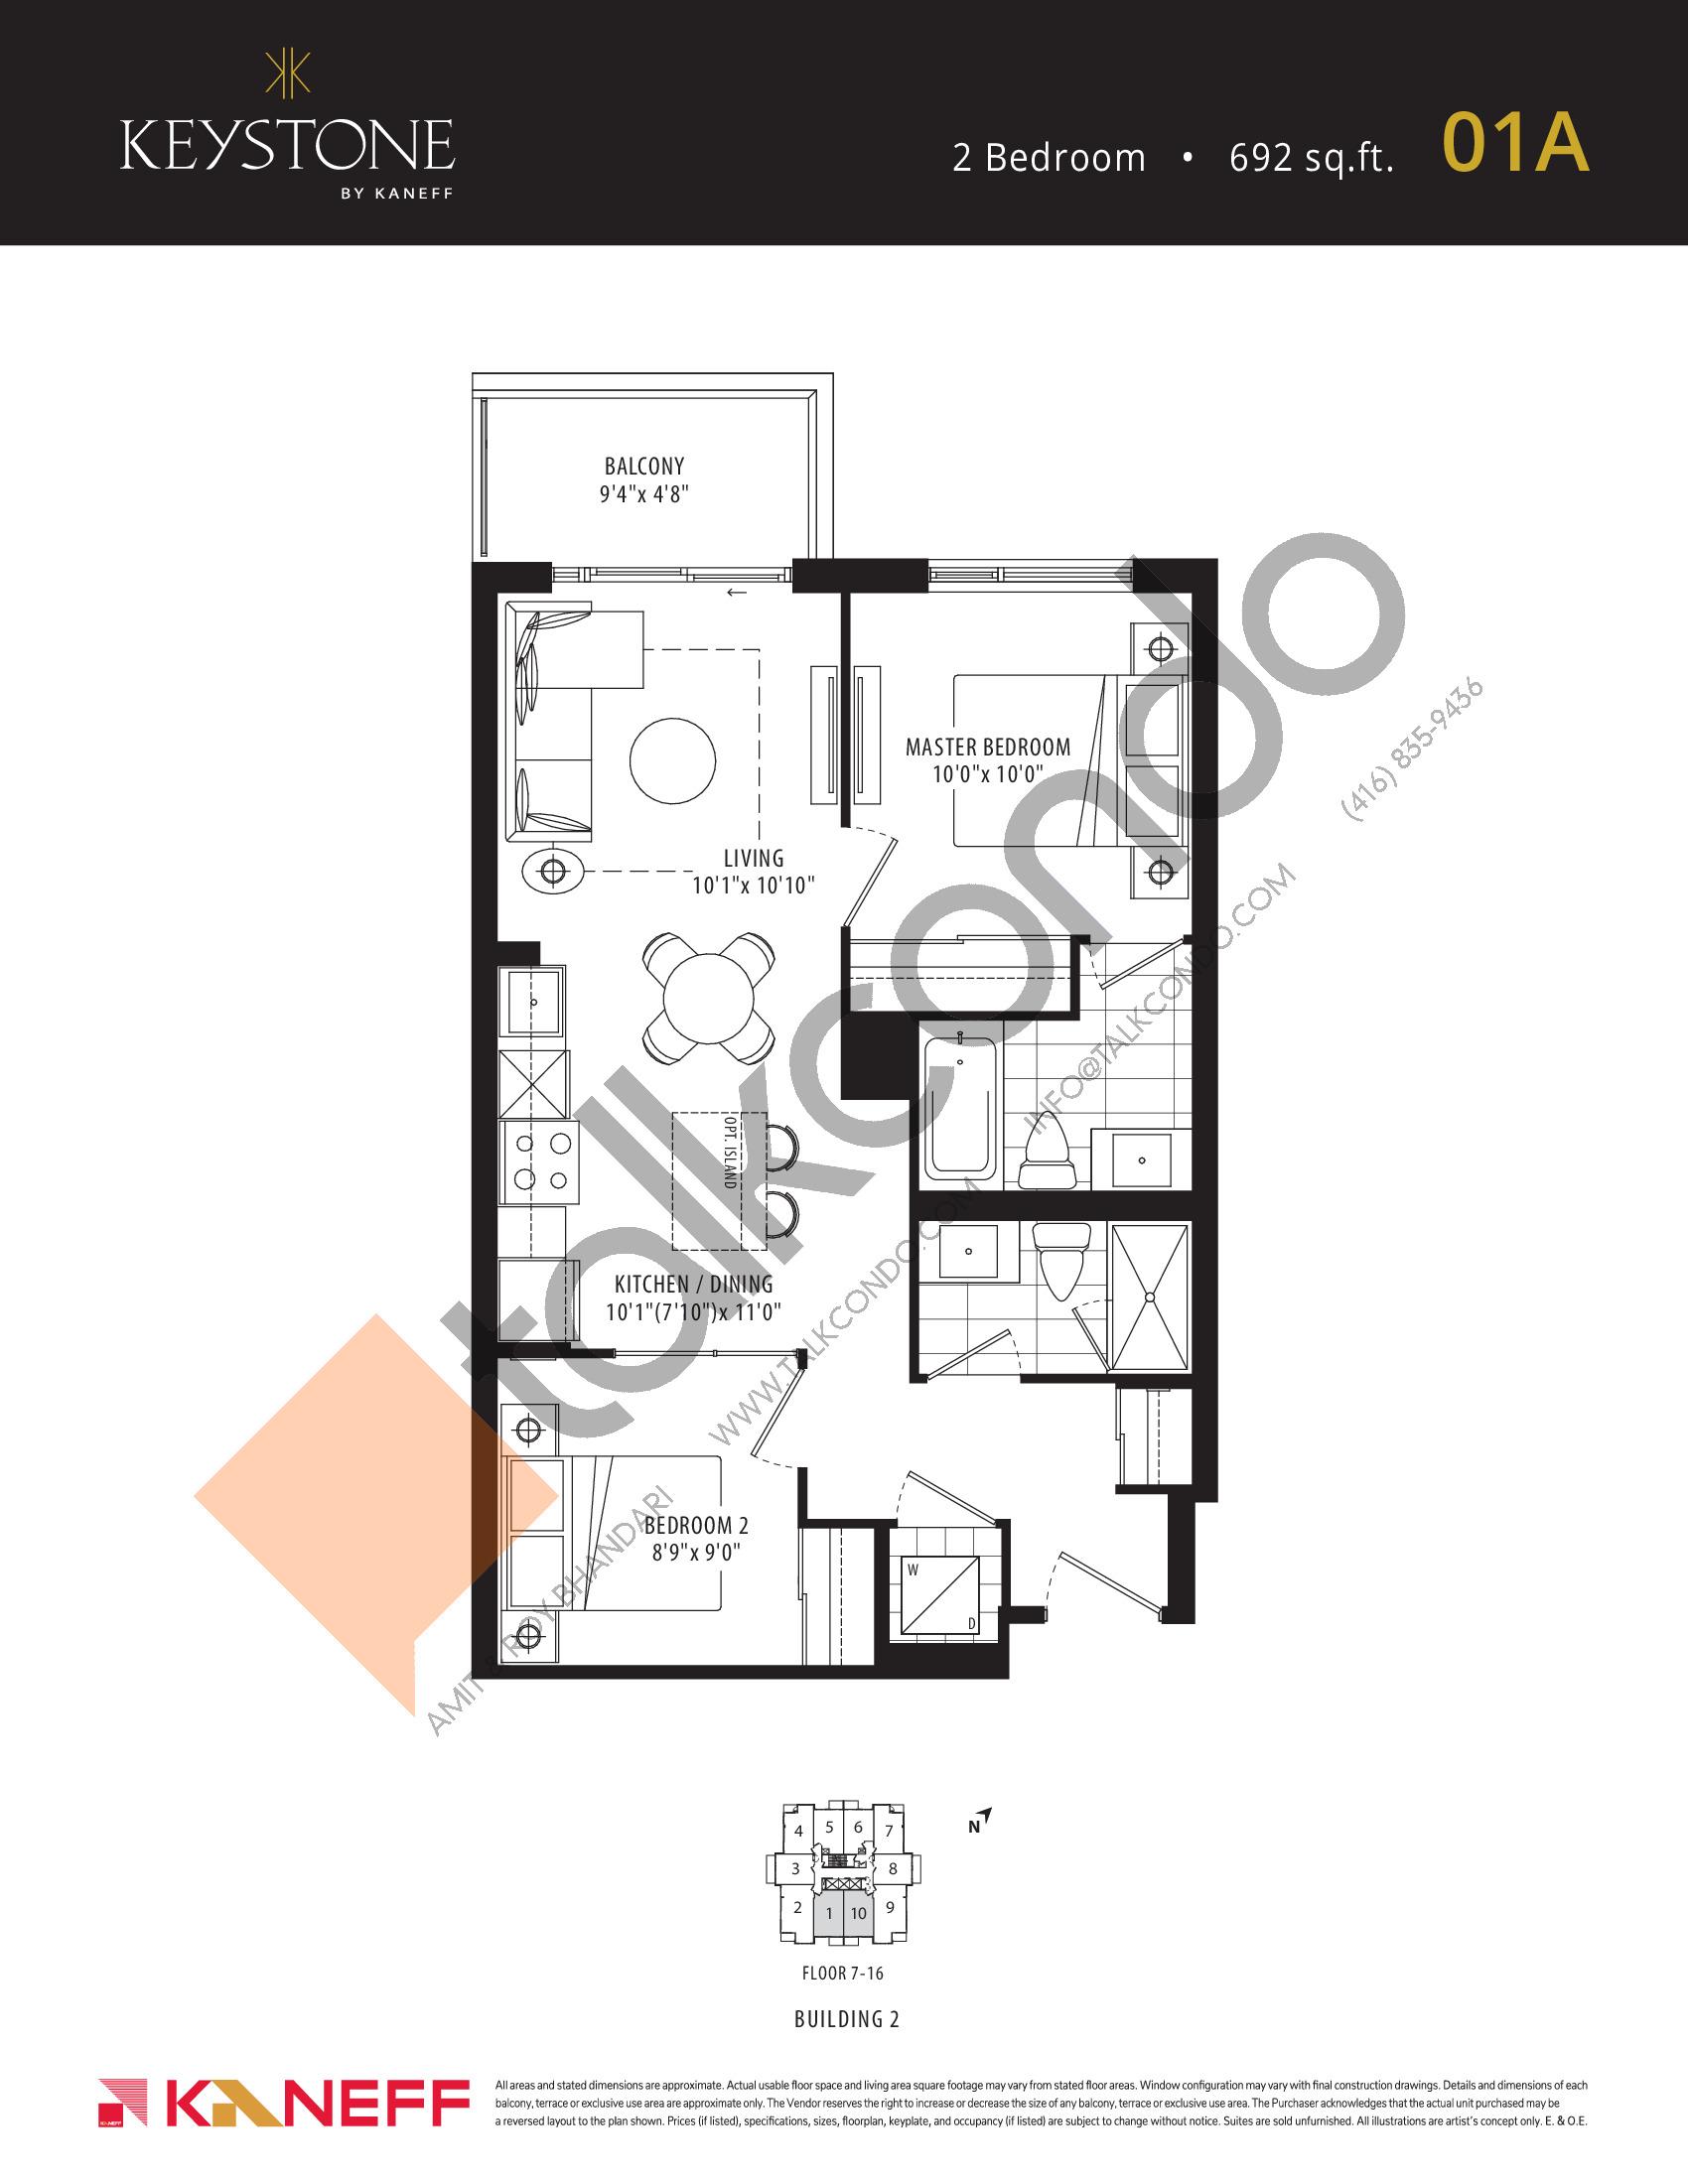 01A Floor Plan at Keystone Condos Phase 2 - 692 sq.ft